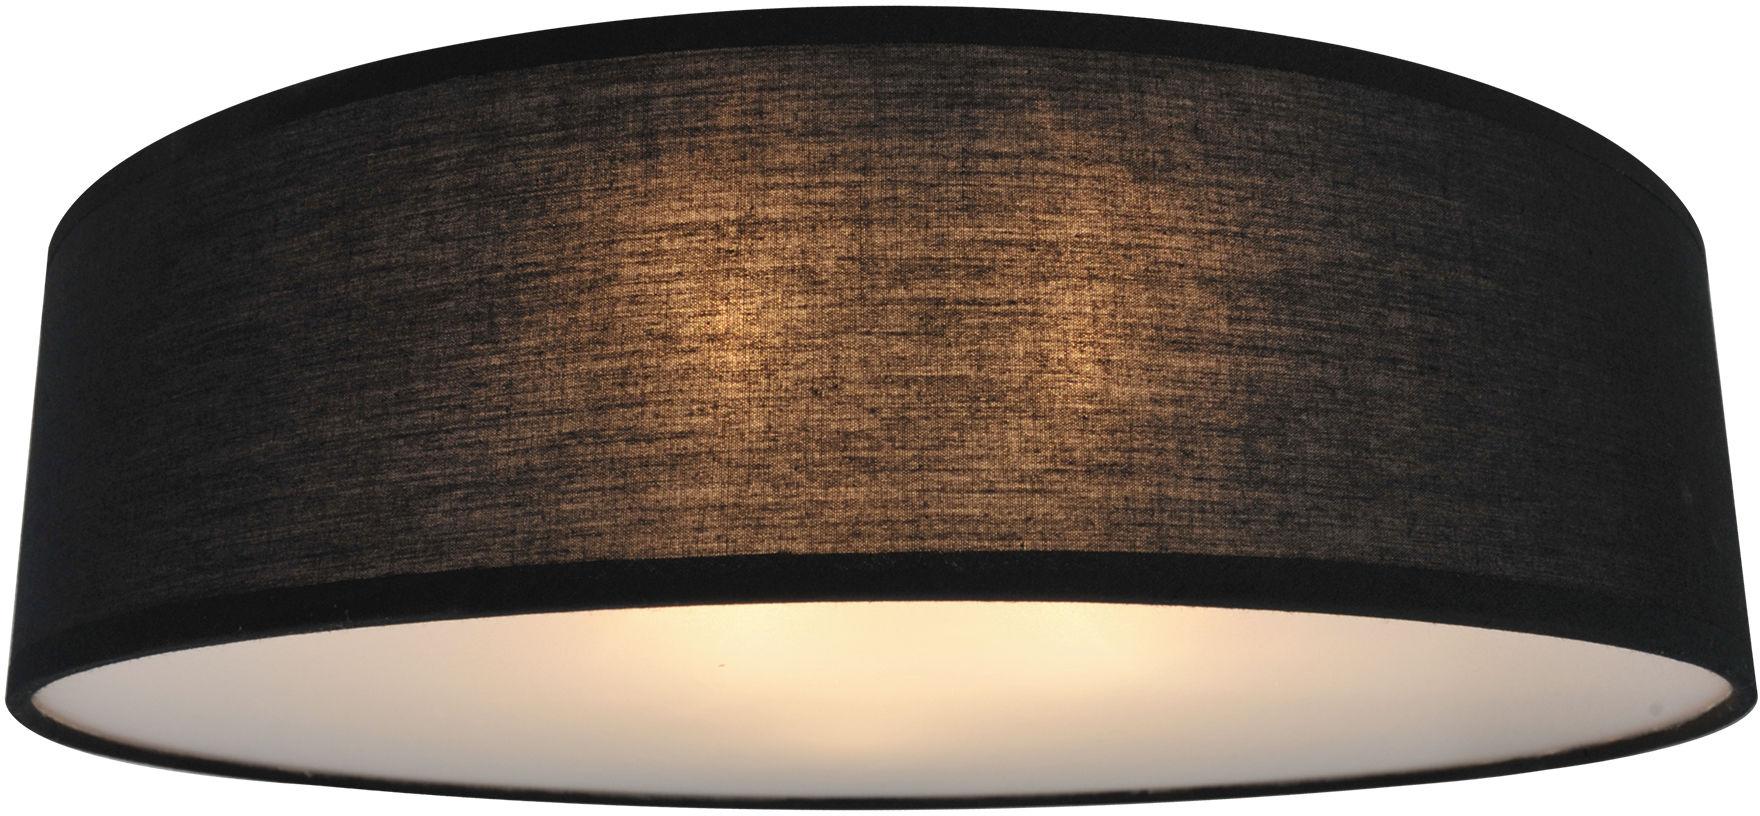 Zuma Line CL12029-D40-BK CLARA plafon lampa sufitowa czarny 2xE14 60W 40cm